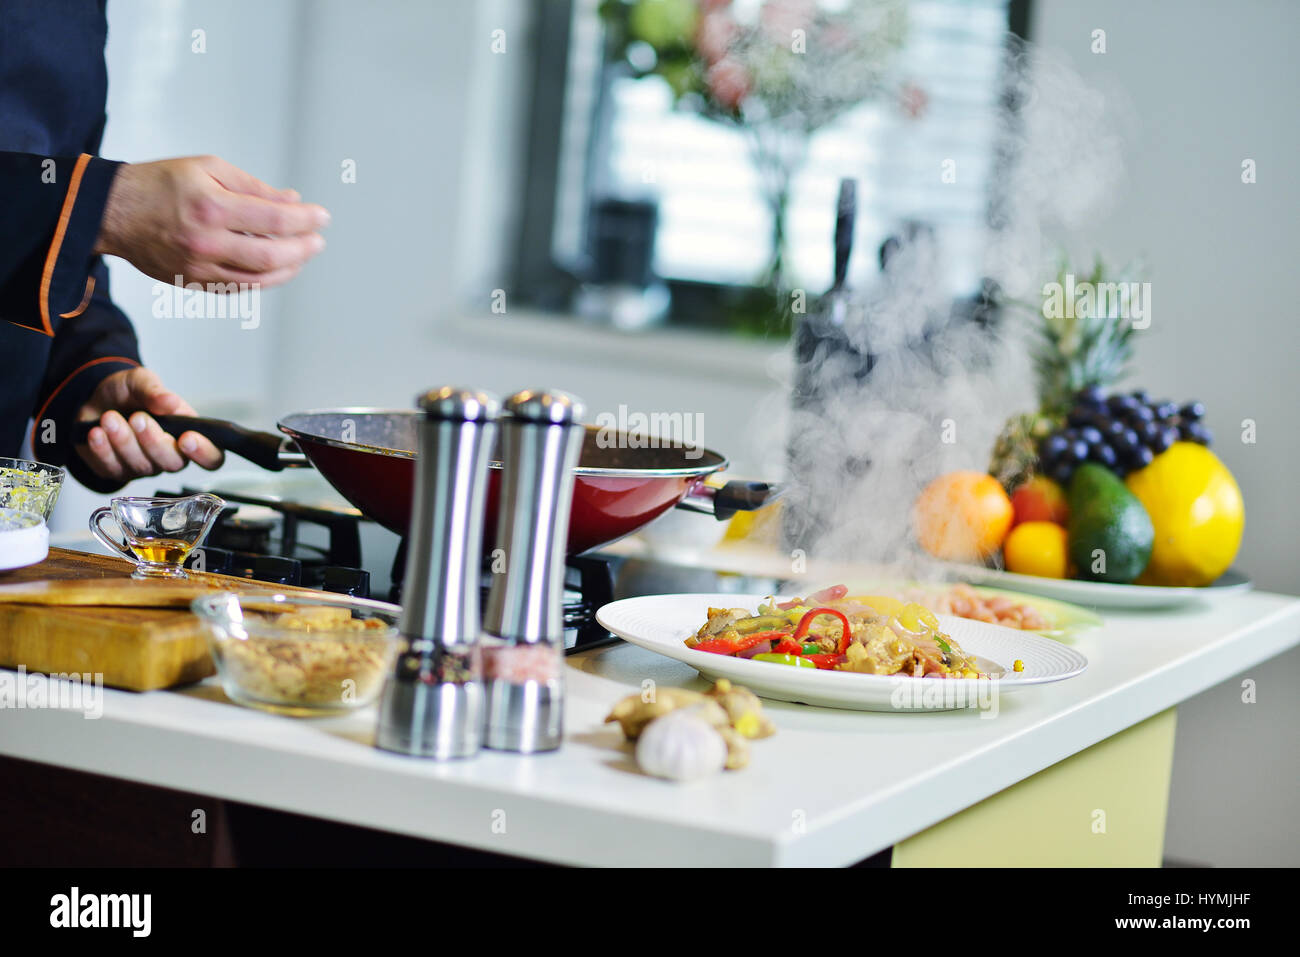 Mature Chef Preparing Meal Various Stock Photos & Mature Chef ...